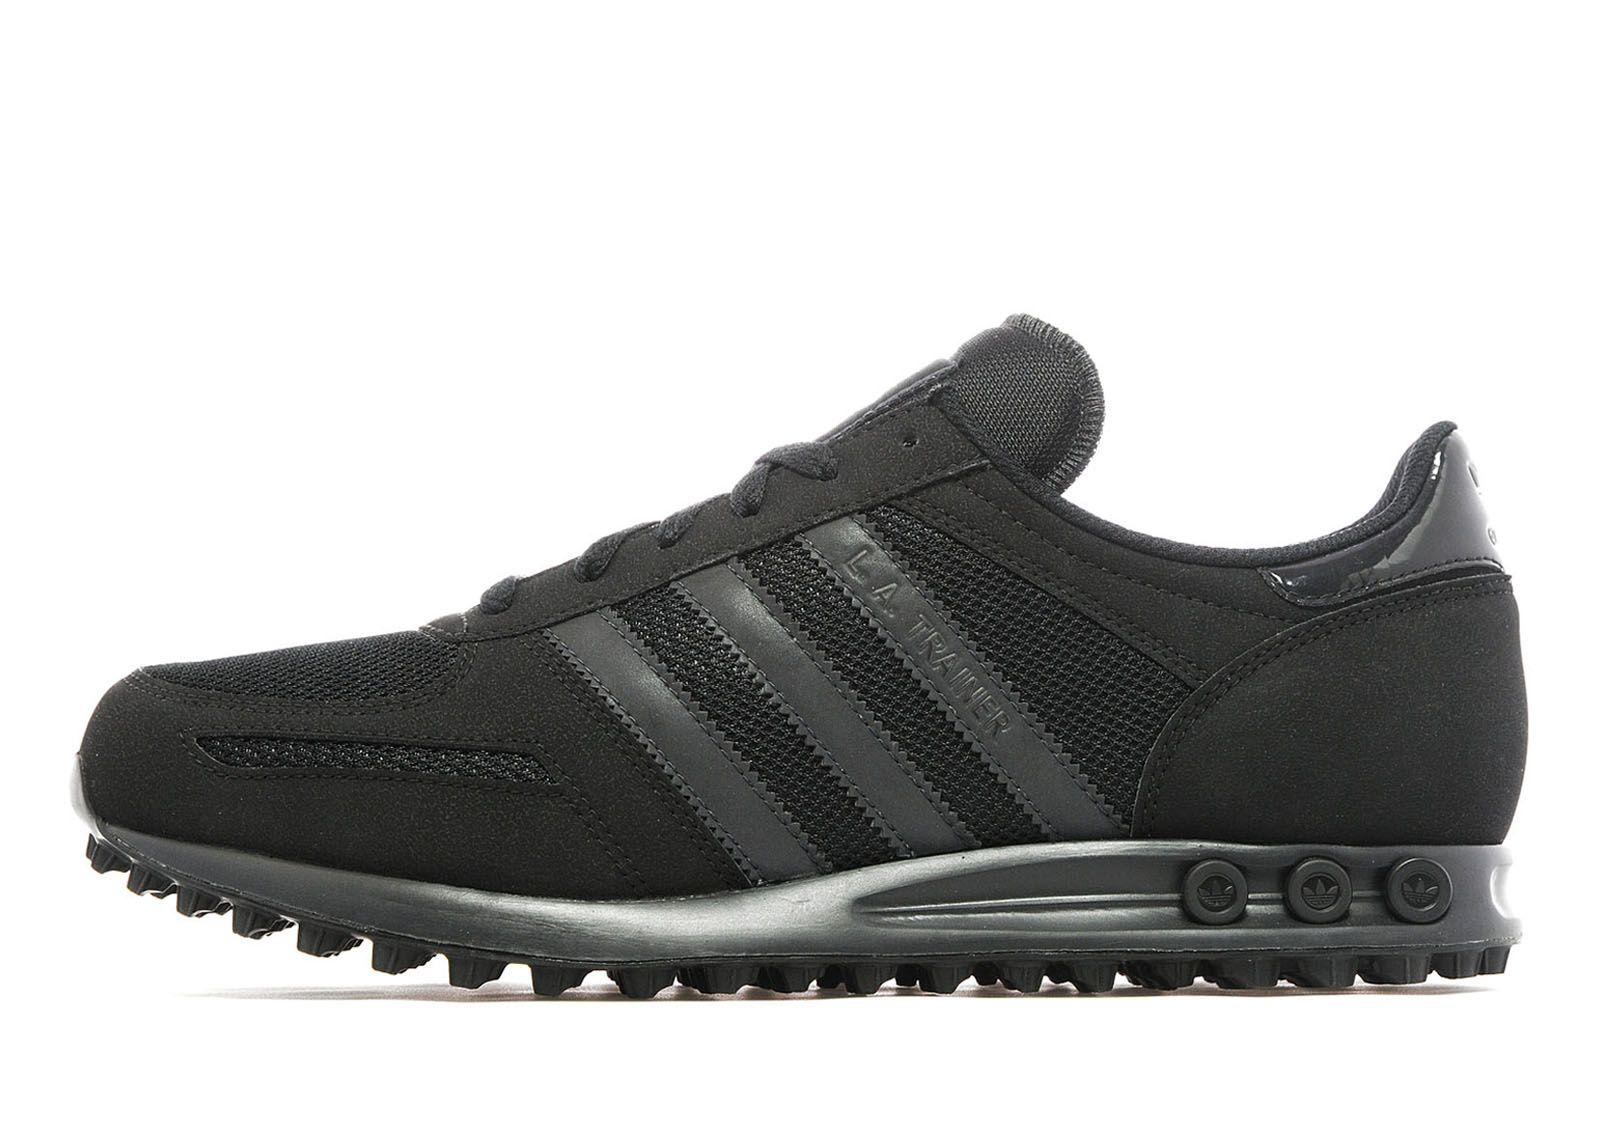 Adidas La Trainer oreo